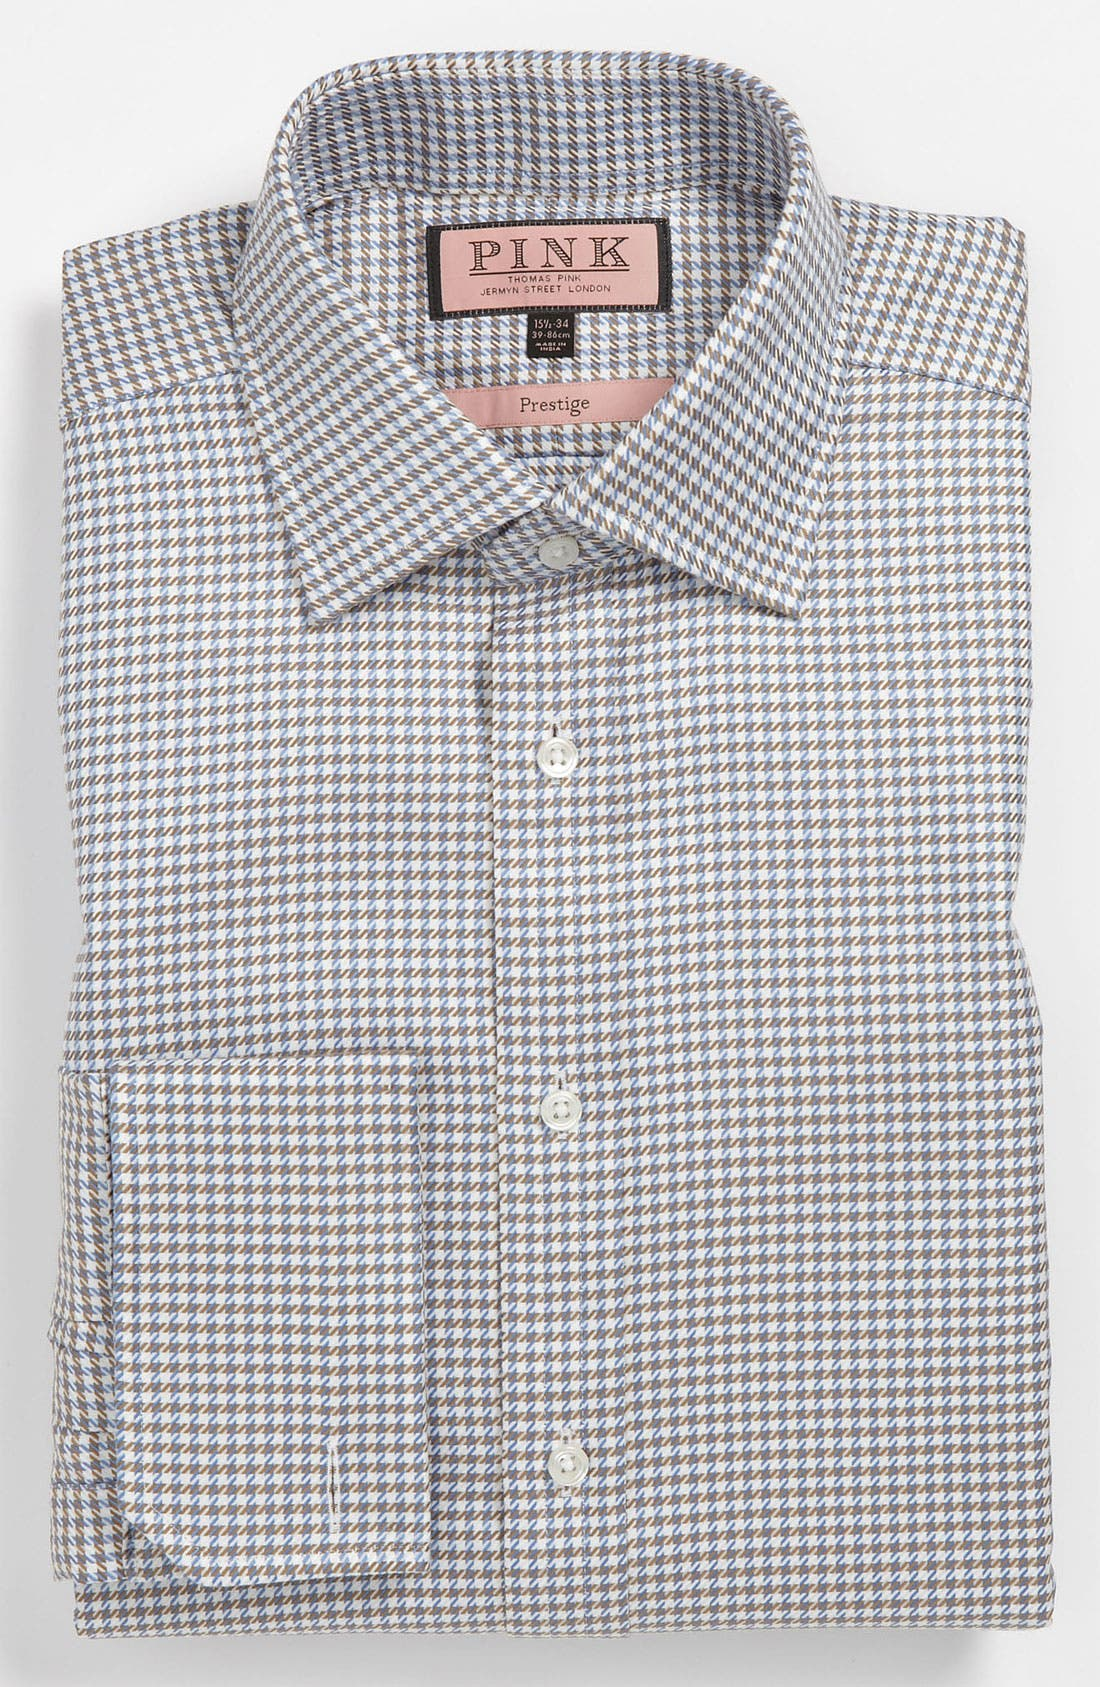 Main Image - Thomas Pink Classic Fit Prestige Dress Shirt